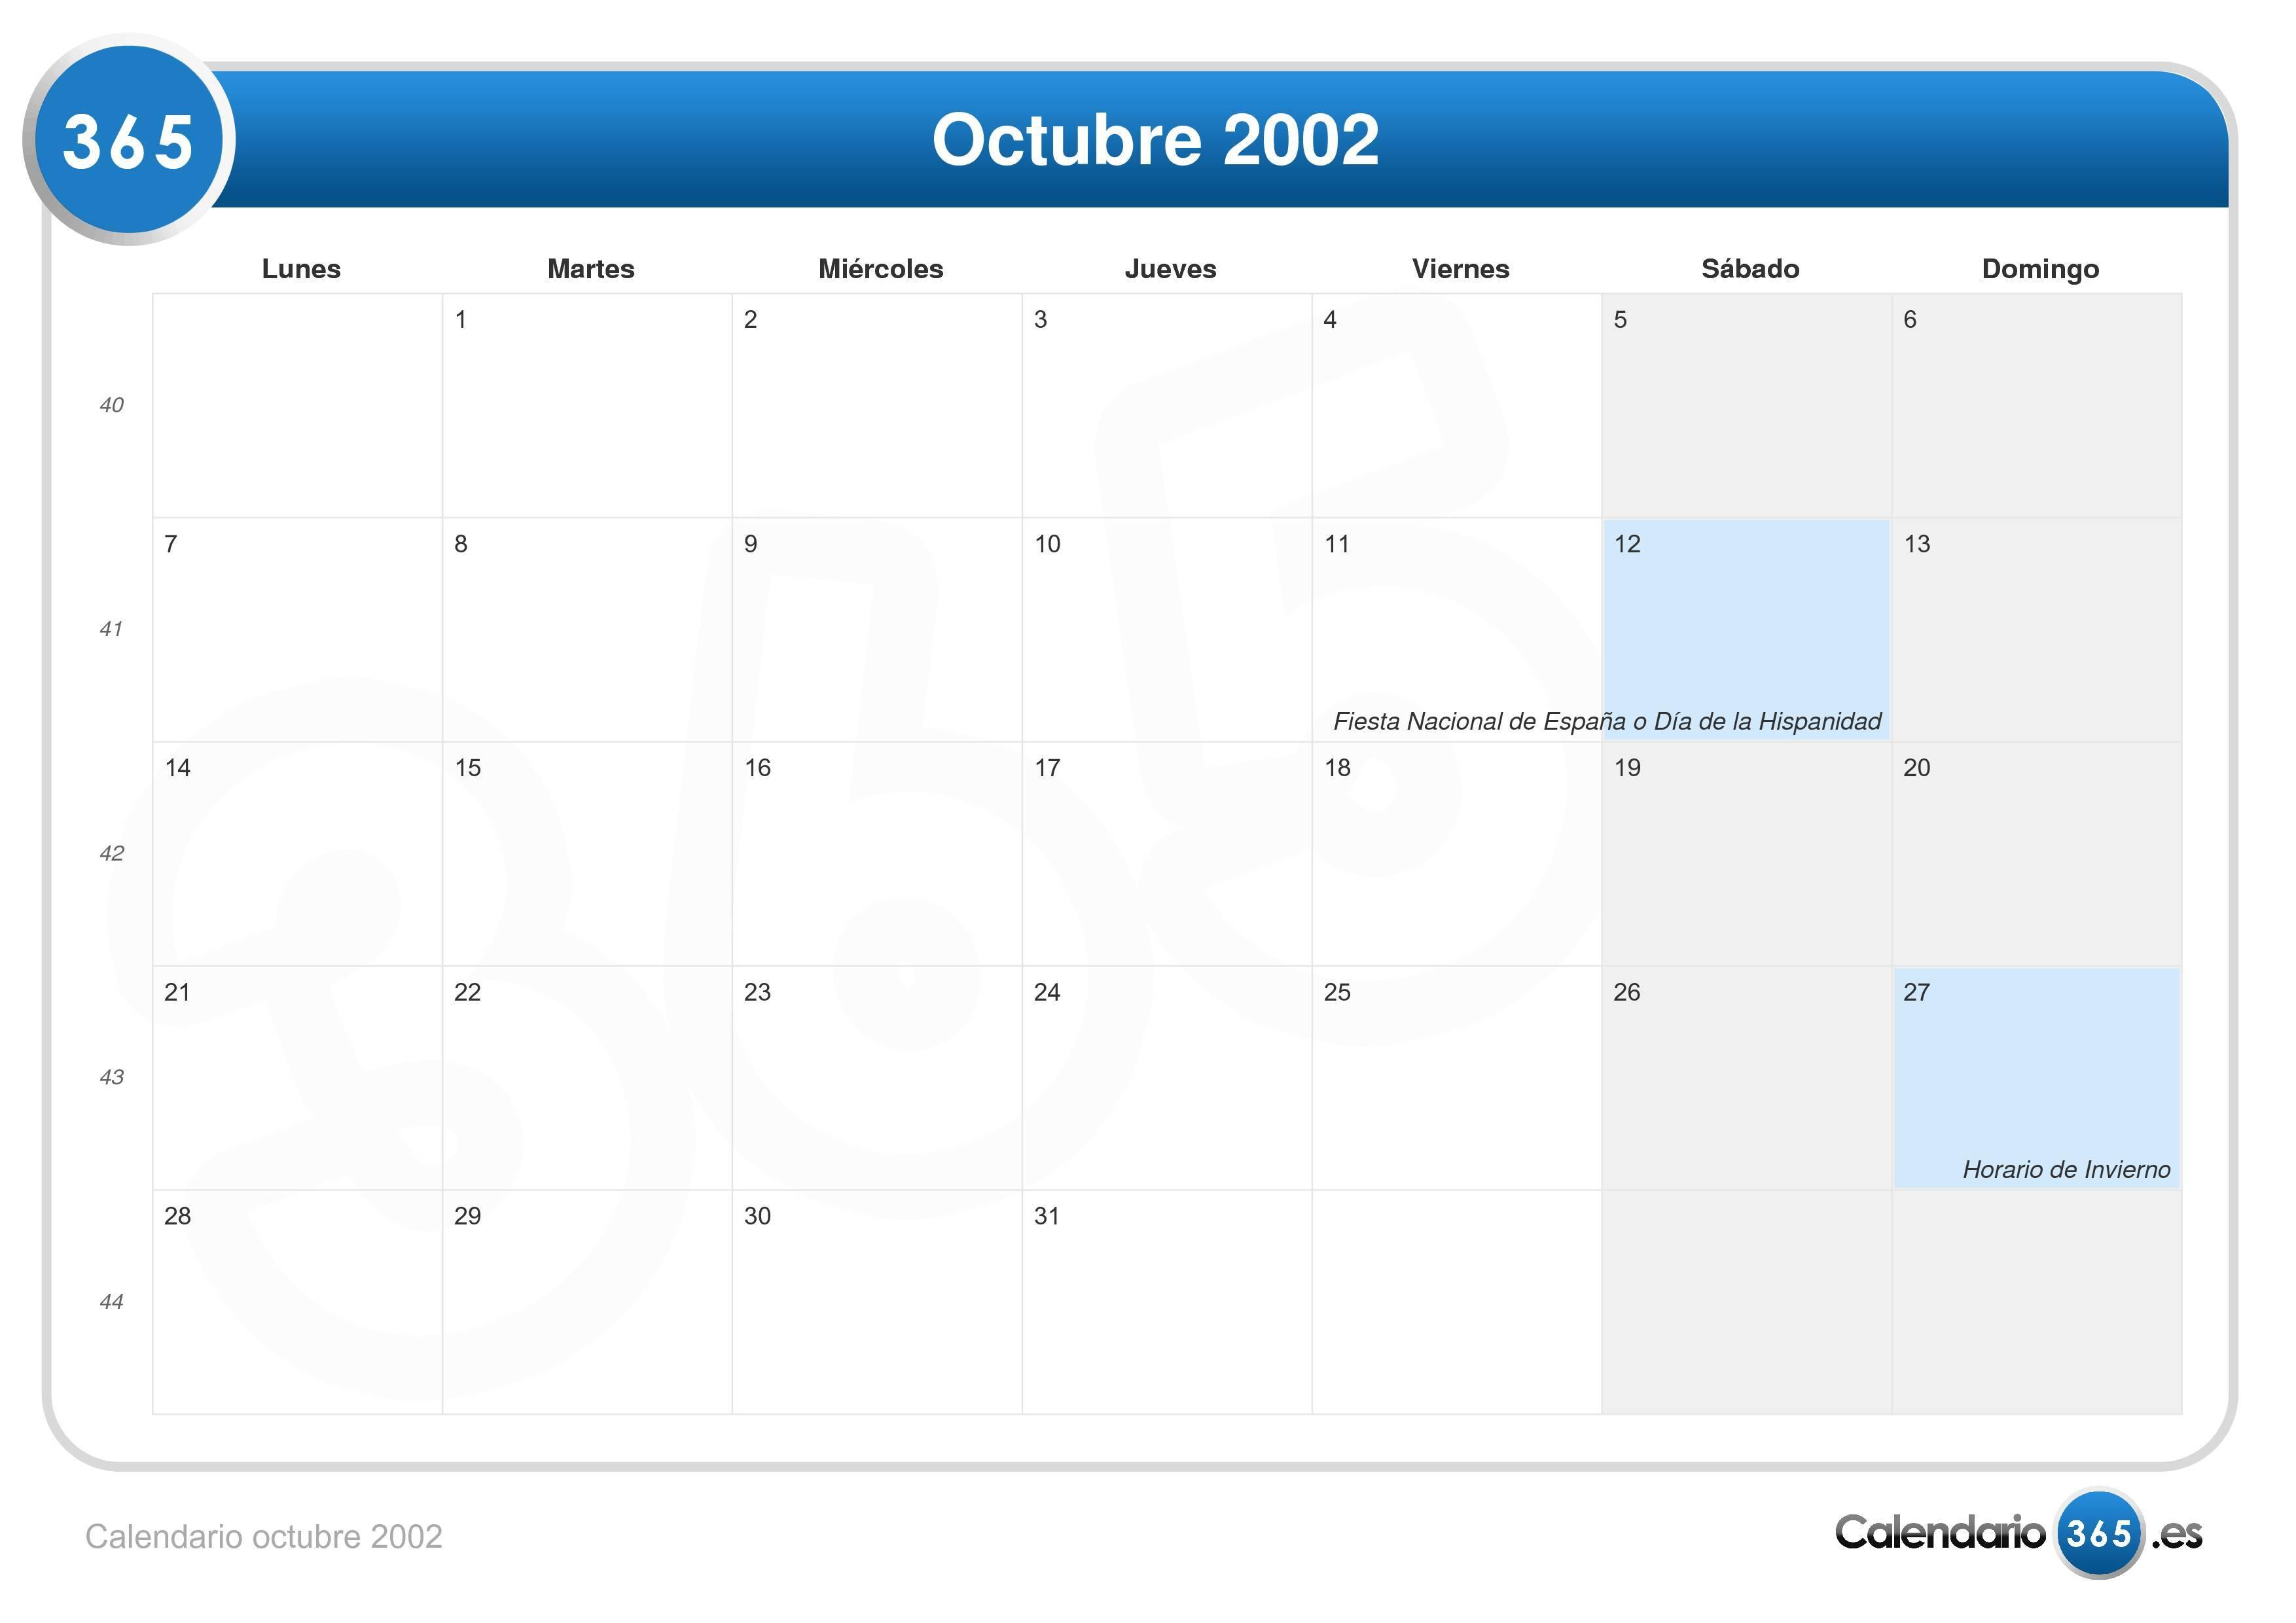 27 octubre 2002: